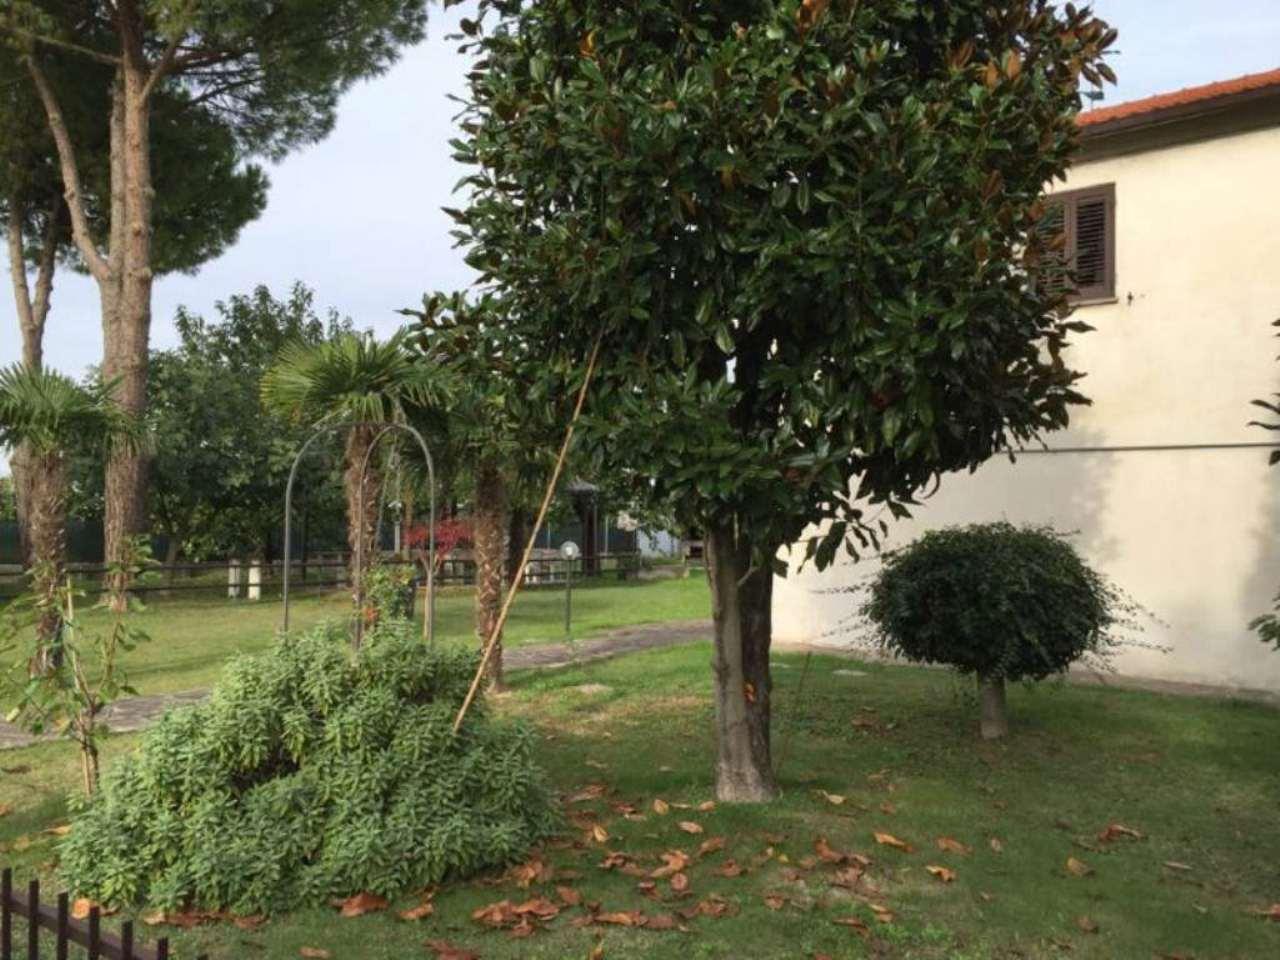 Casa indipendente in Vendita a Ravenna Periferia Nord: 5 locali, 270 mq